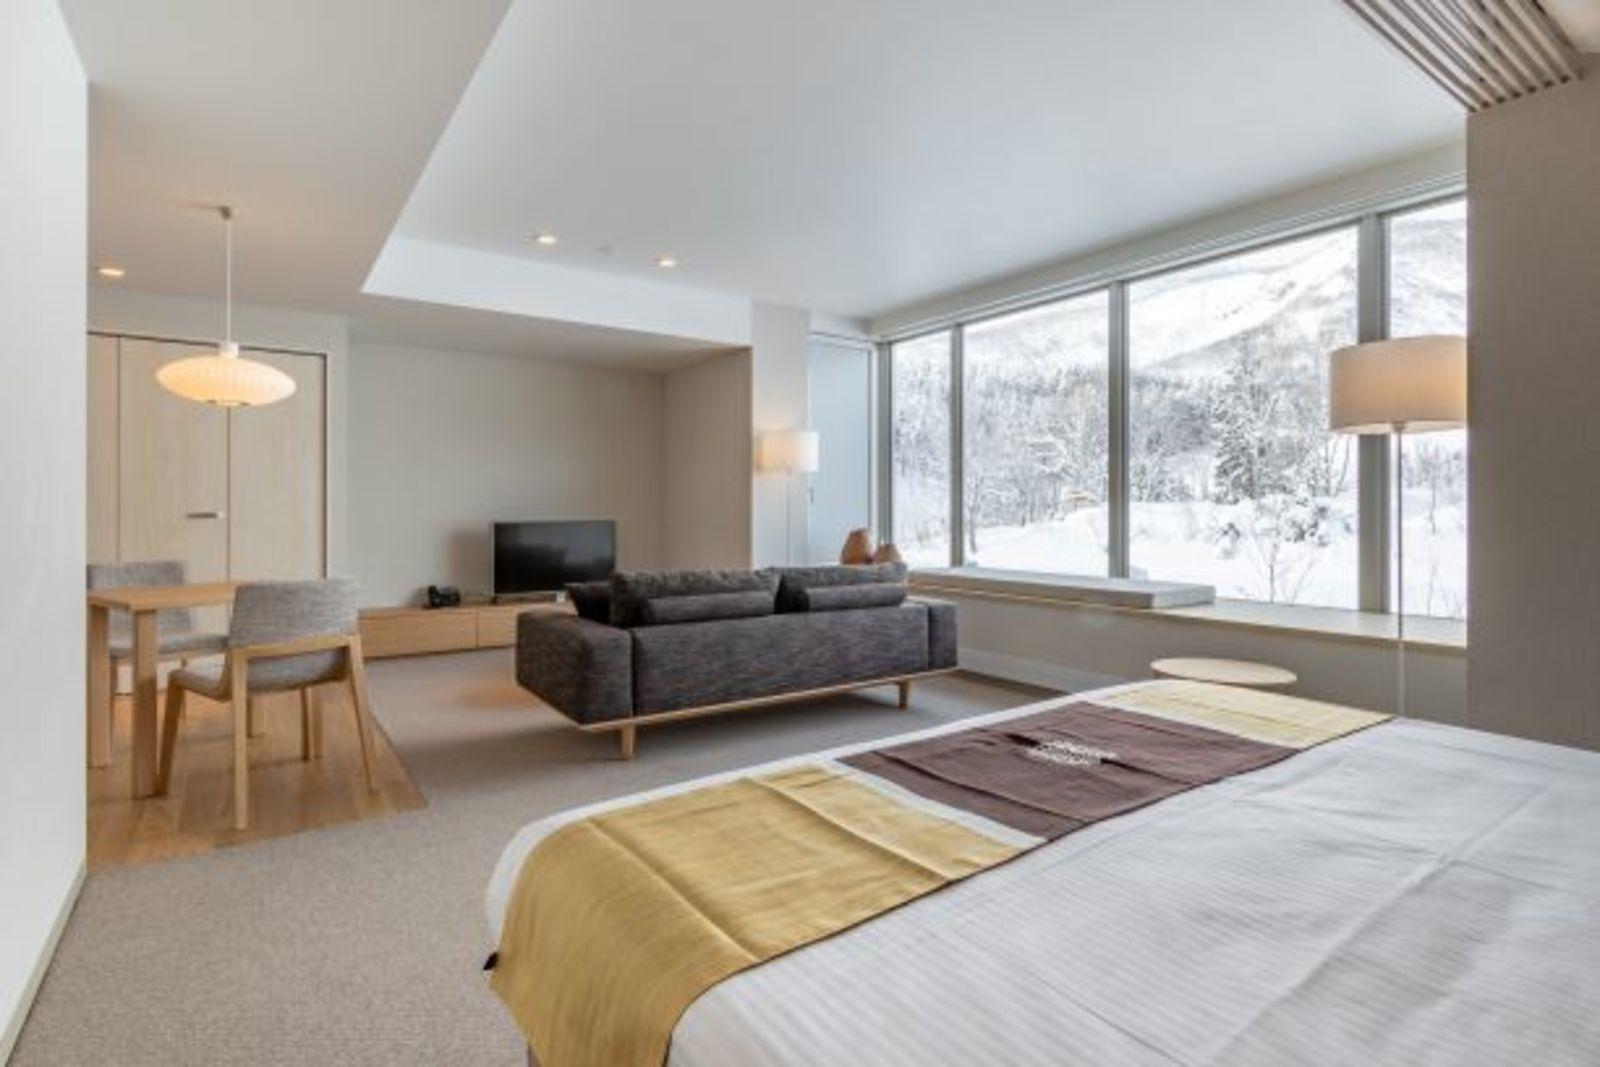 Mountain Studio Apartment The Maples Niseko Vacation Niseko